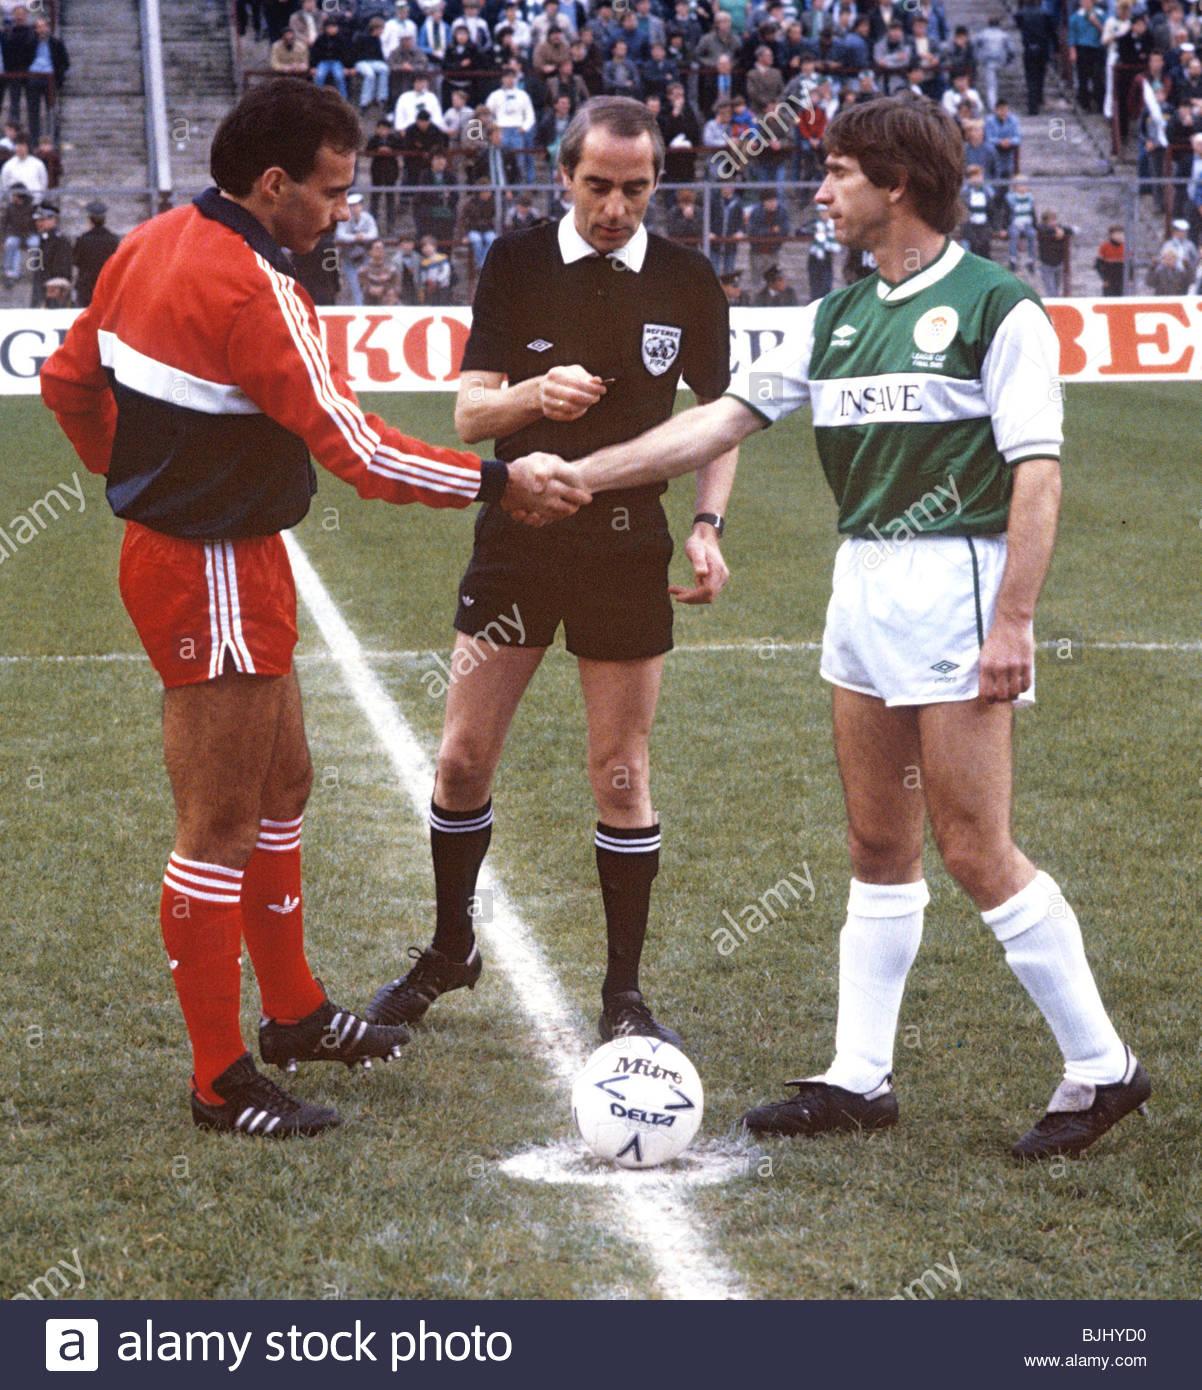 27/10/85 SKOL CUP FINAL ABERDEEN V HIBS (3 0) HAMPDEN   GLASGOW Referee Bob  Valentine Brings The Two Captainu0027s, Aberdeenu0027s